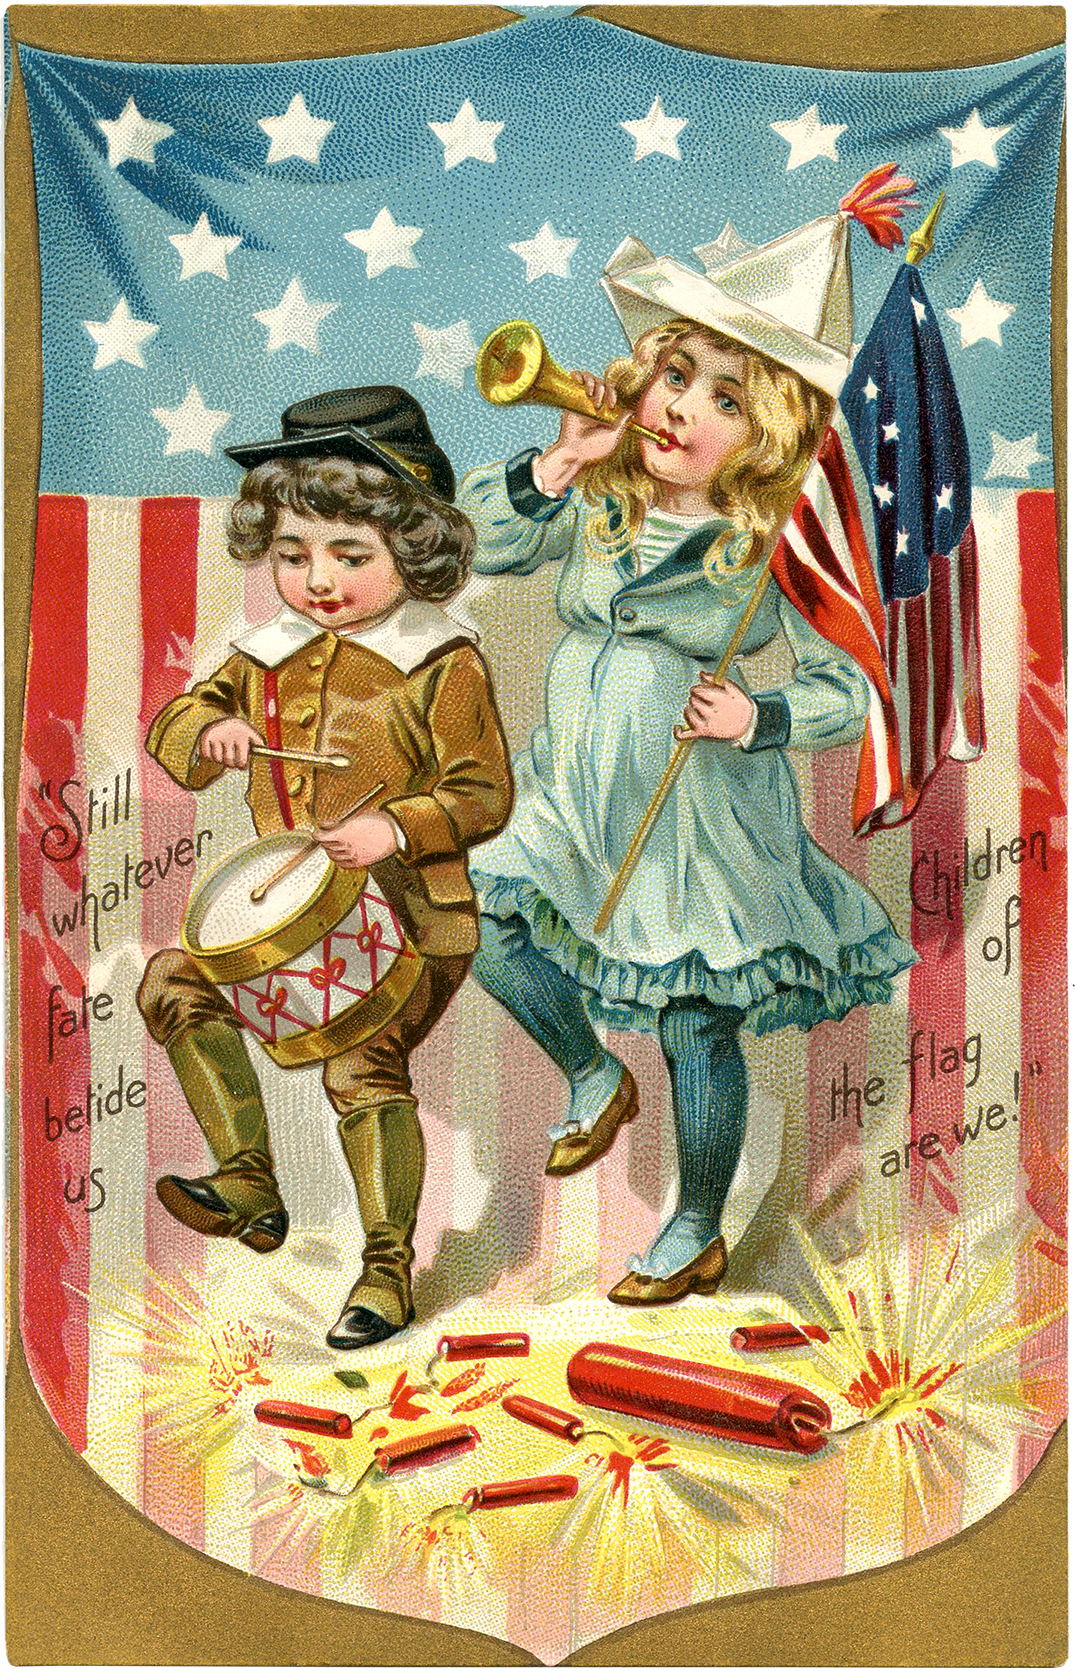 Vintage Patriotic Postcard Image The Graphics Fairy